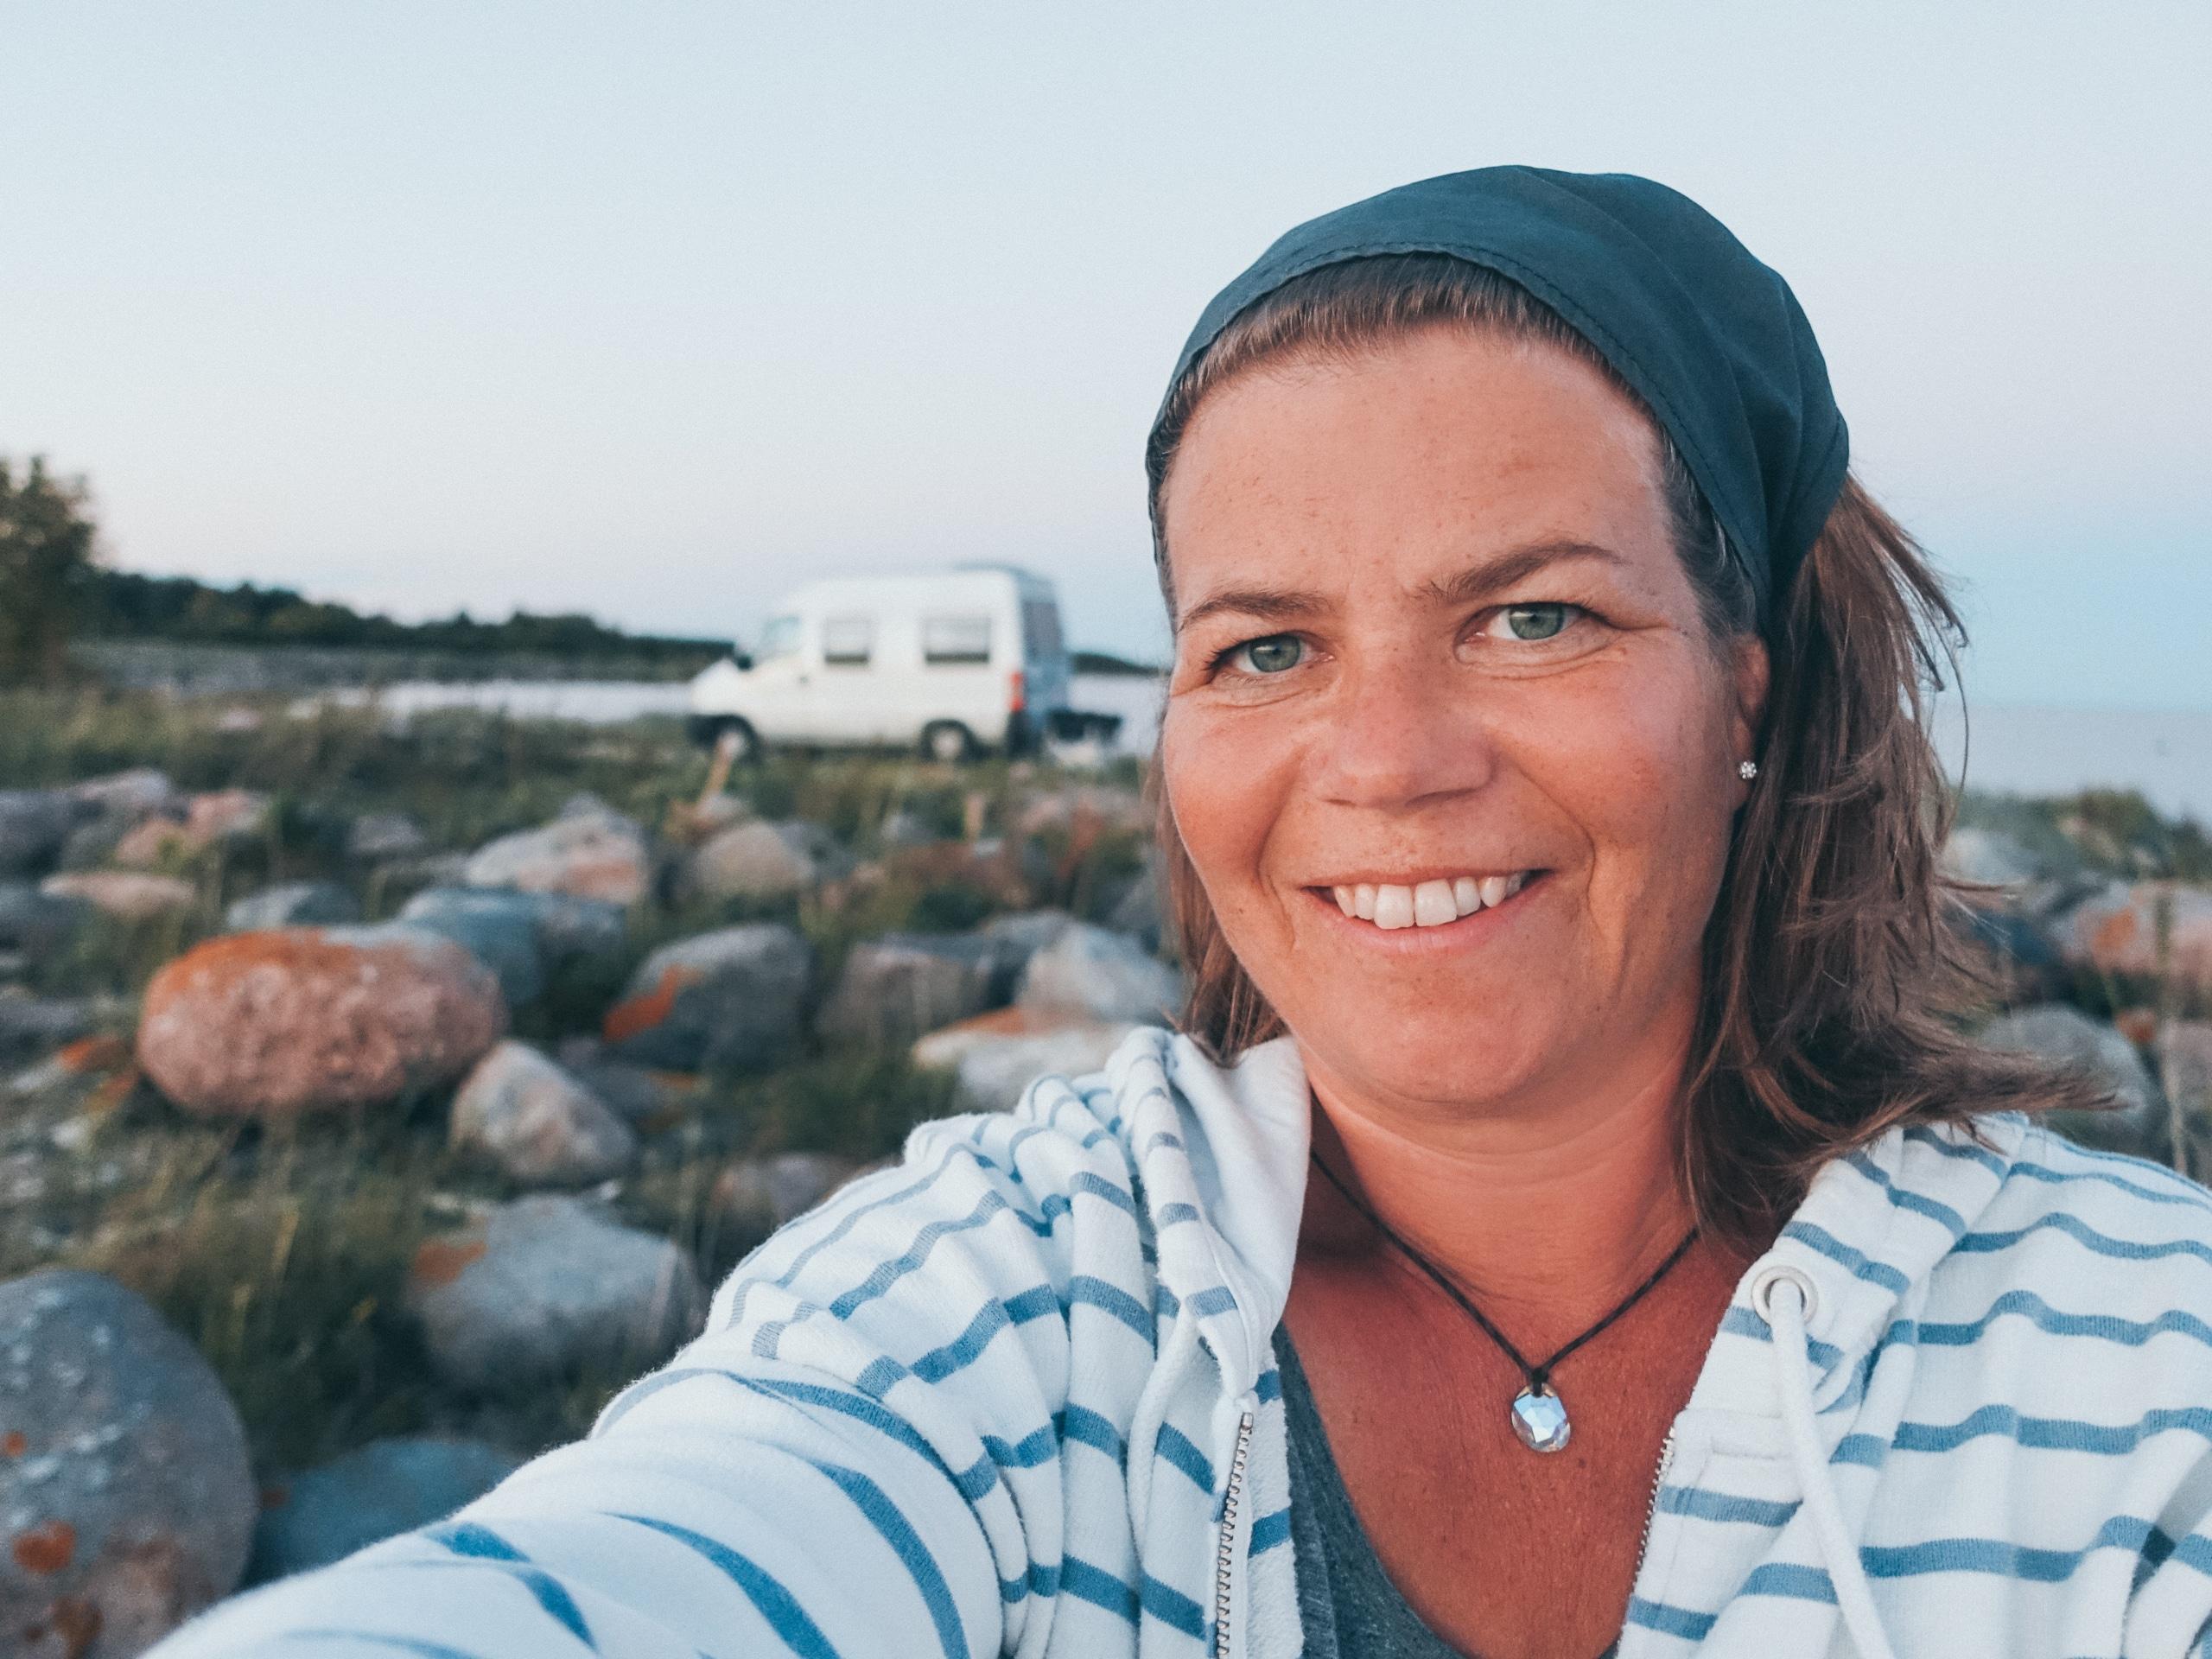 CCW Susanne Flachmann 01 scaled